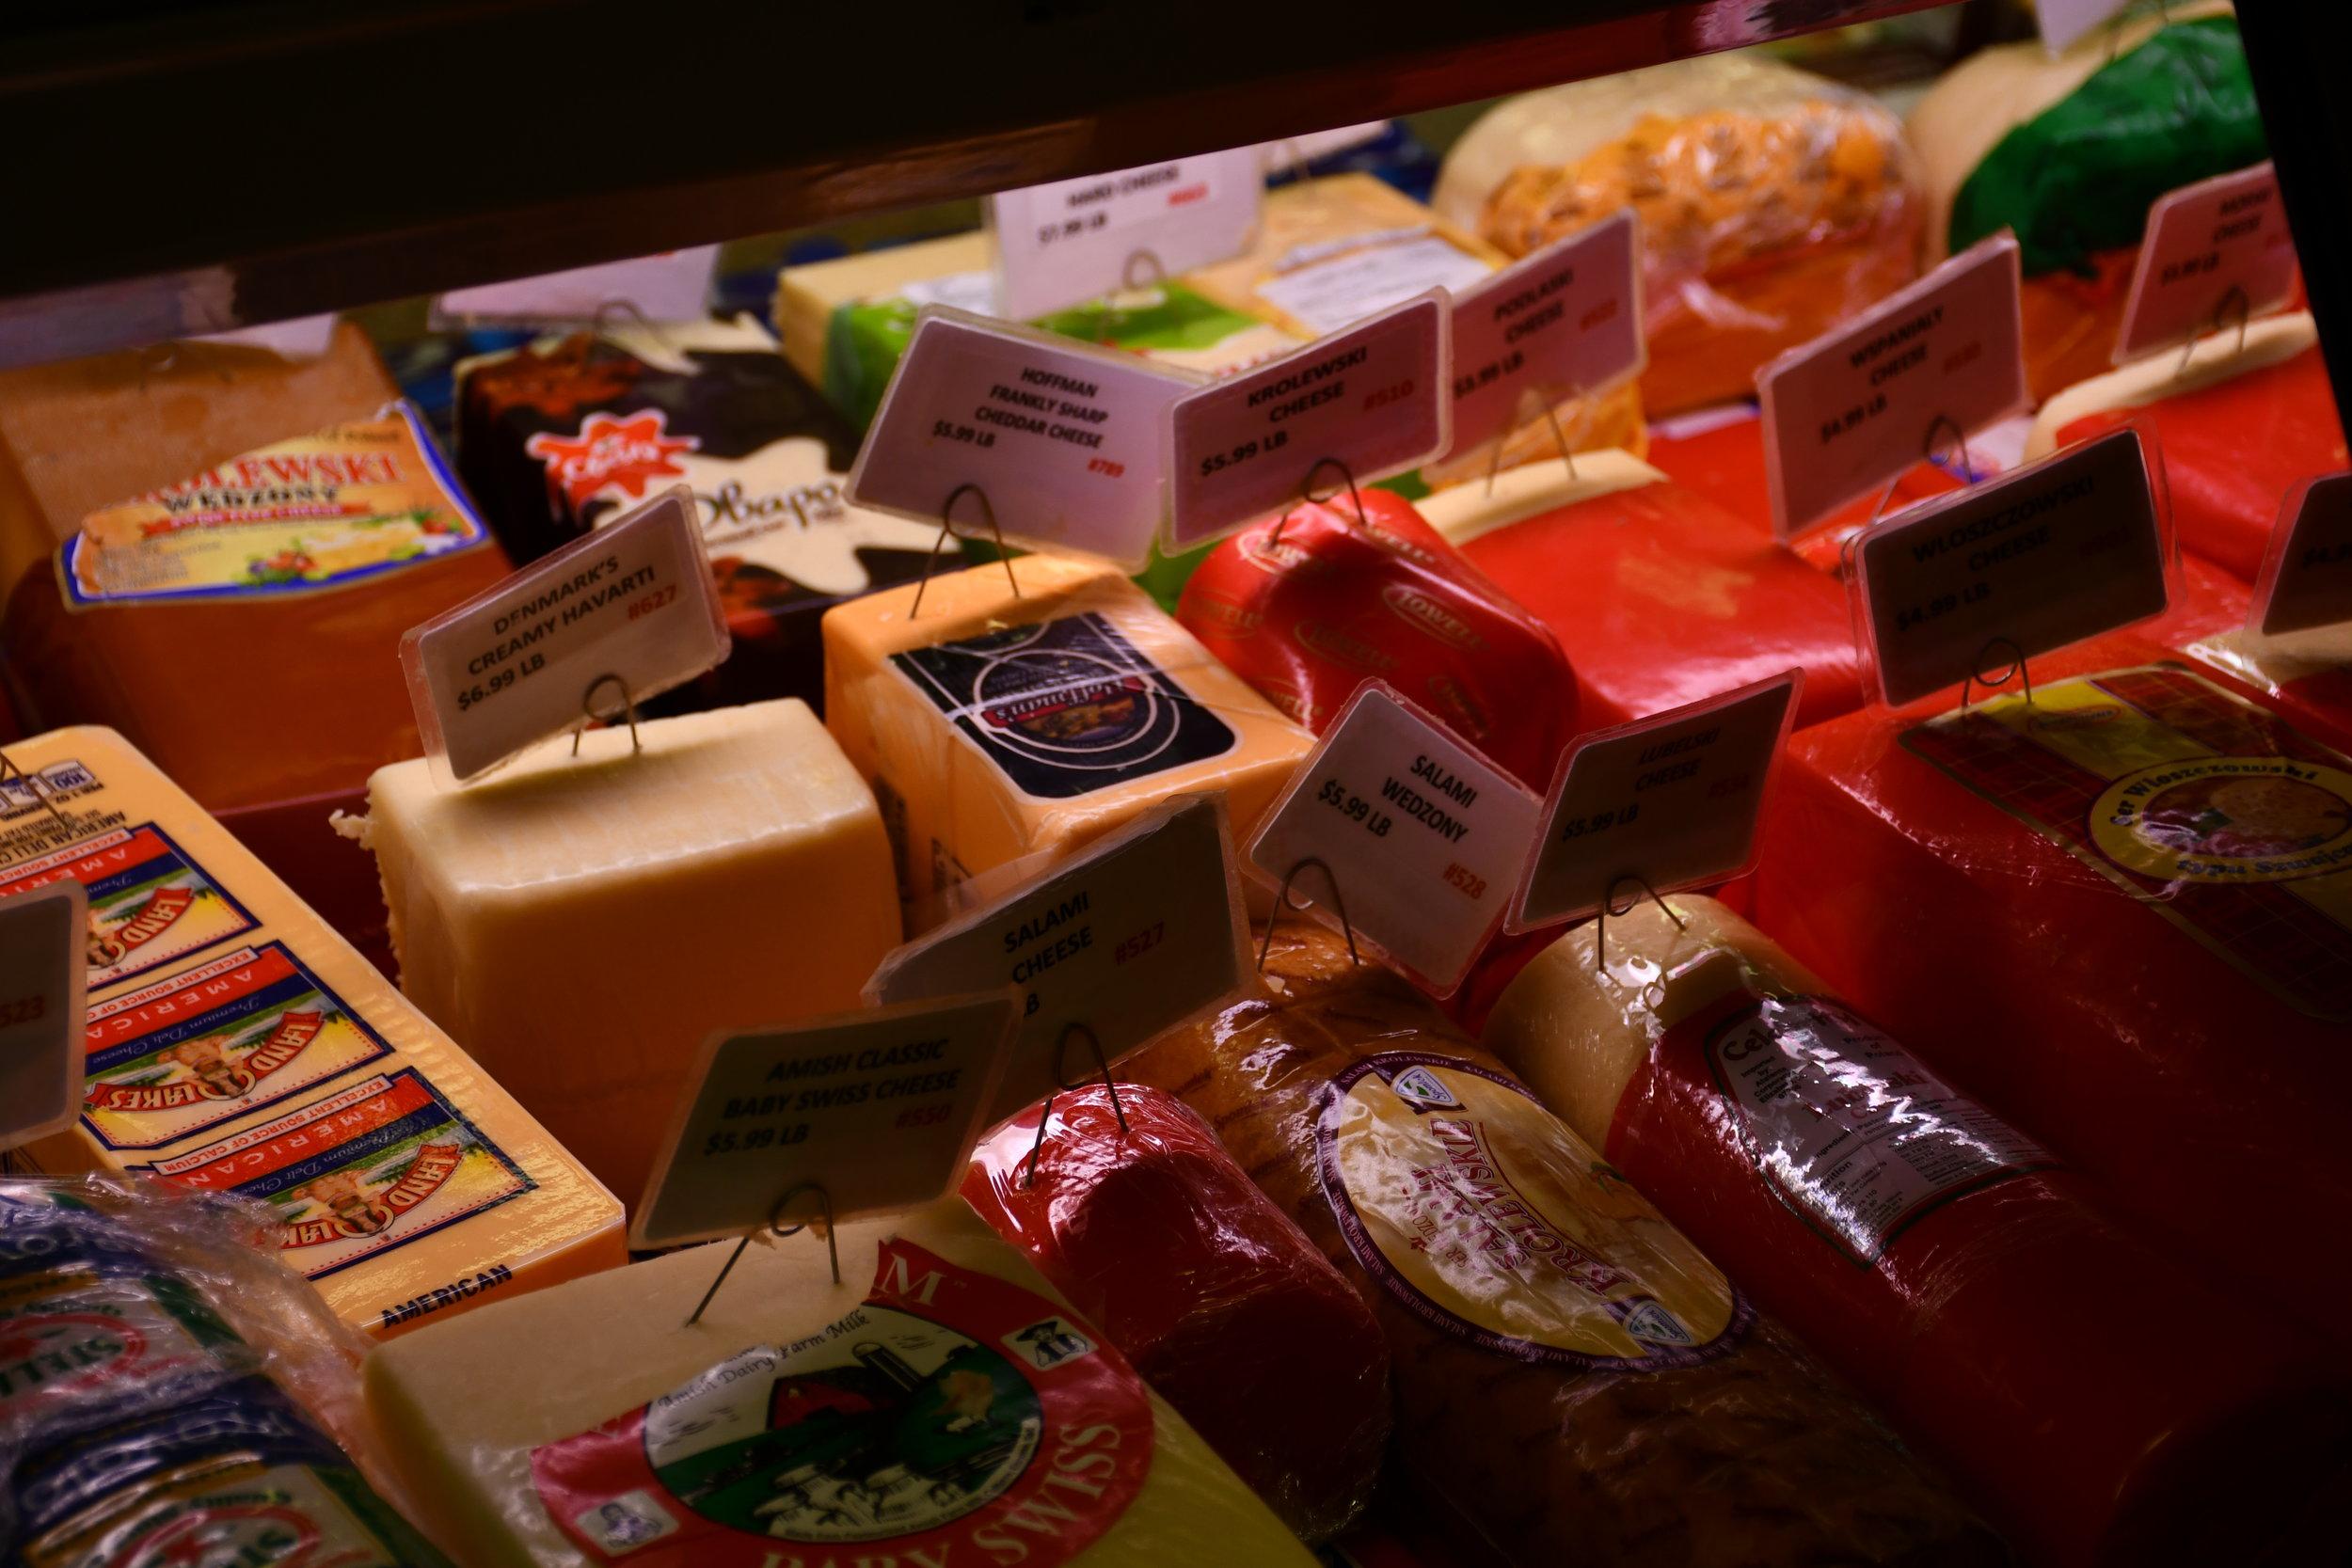 Polish Deli Cheeses | Lassak Market & Deli